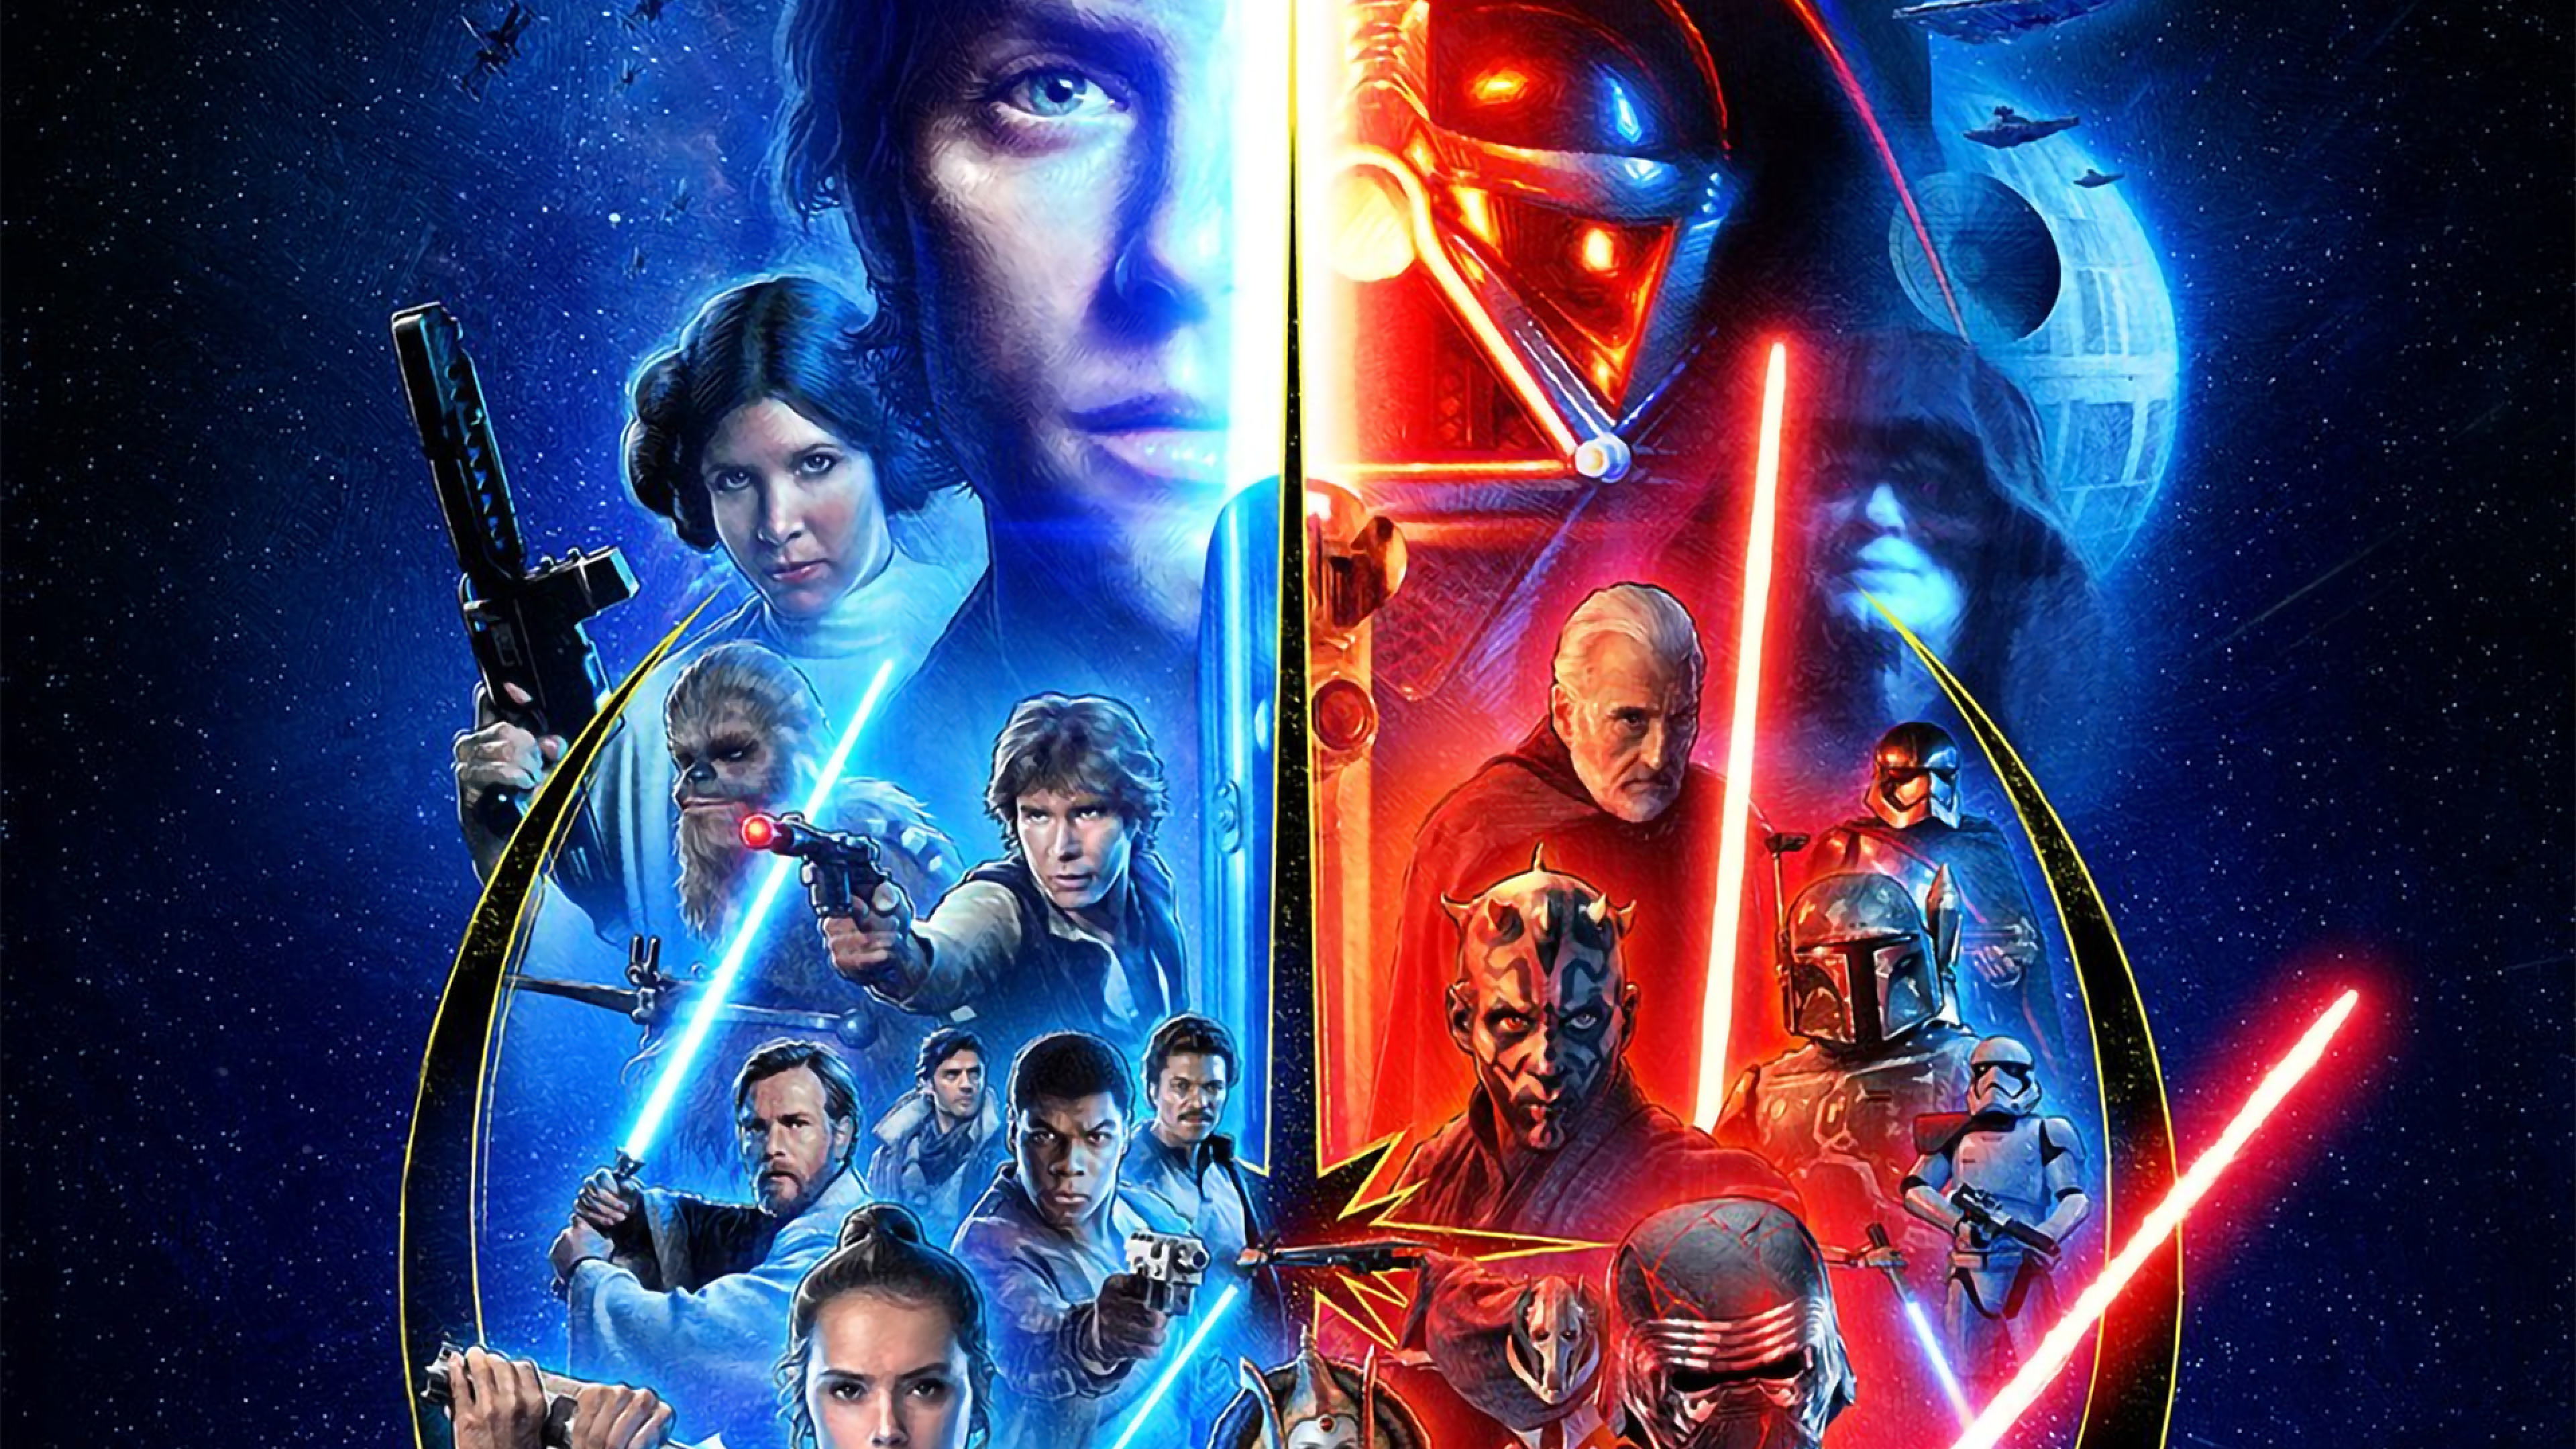 3840x2160 Star Wars Skywalker Saga 4k Wallpaper Hd Movies 4k Wallpapers Images Photos And Background